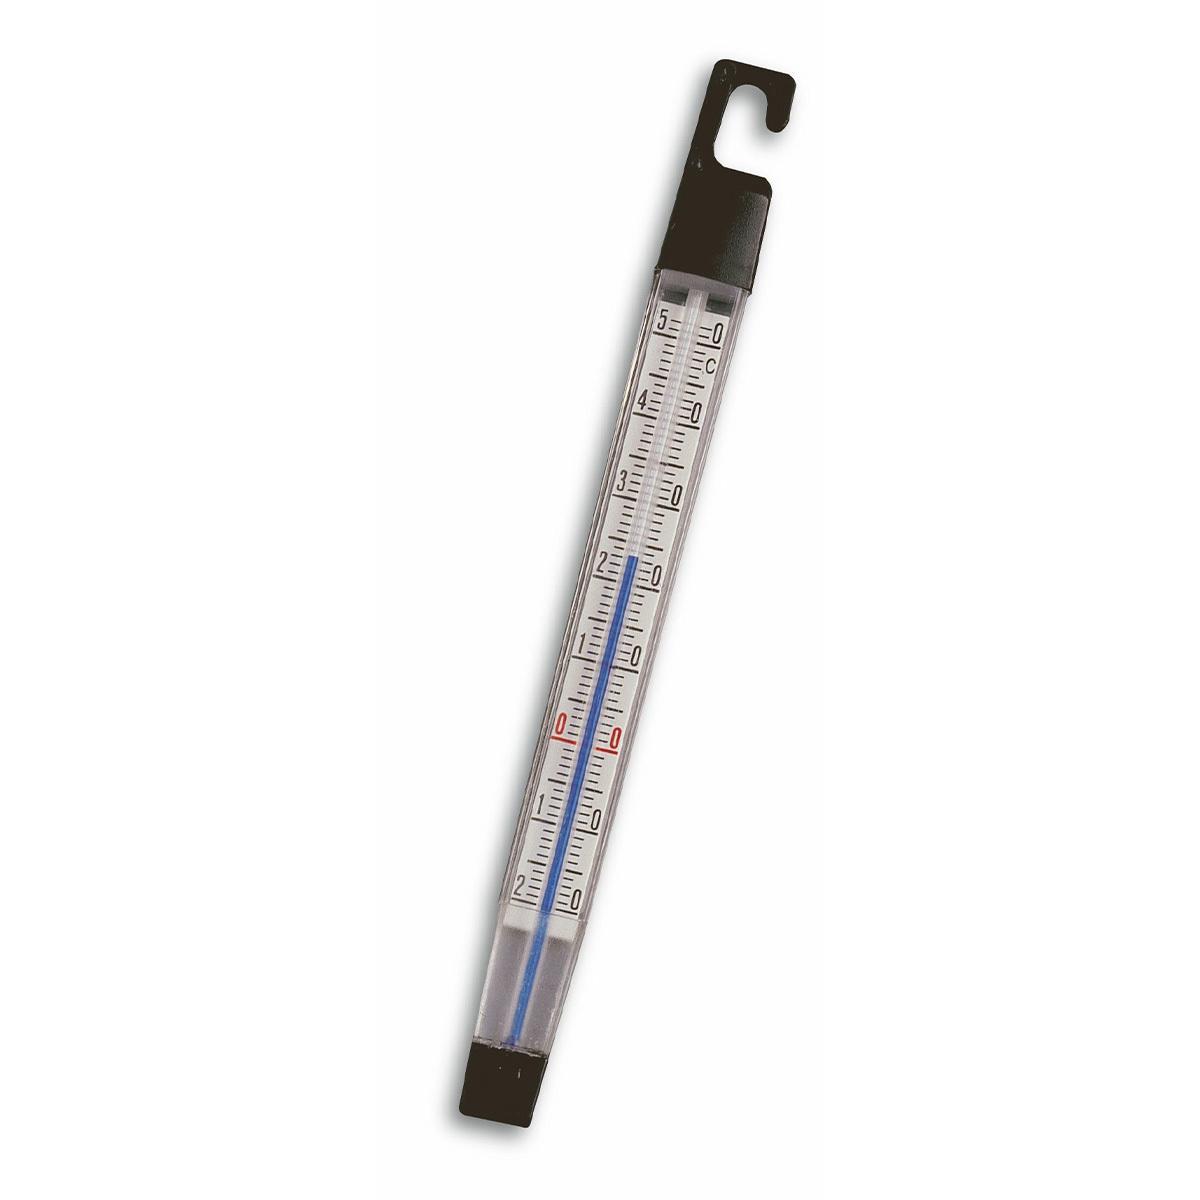 14-1012-analoges-vielzweckthermometer-1200x1200px.jpg